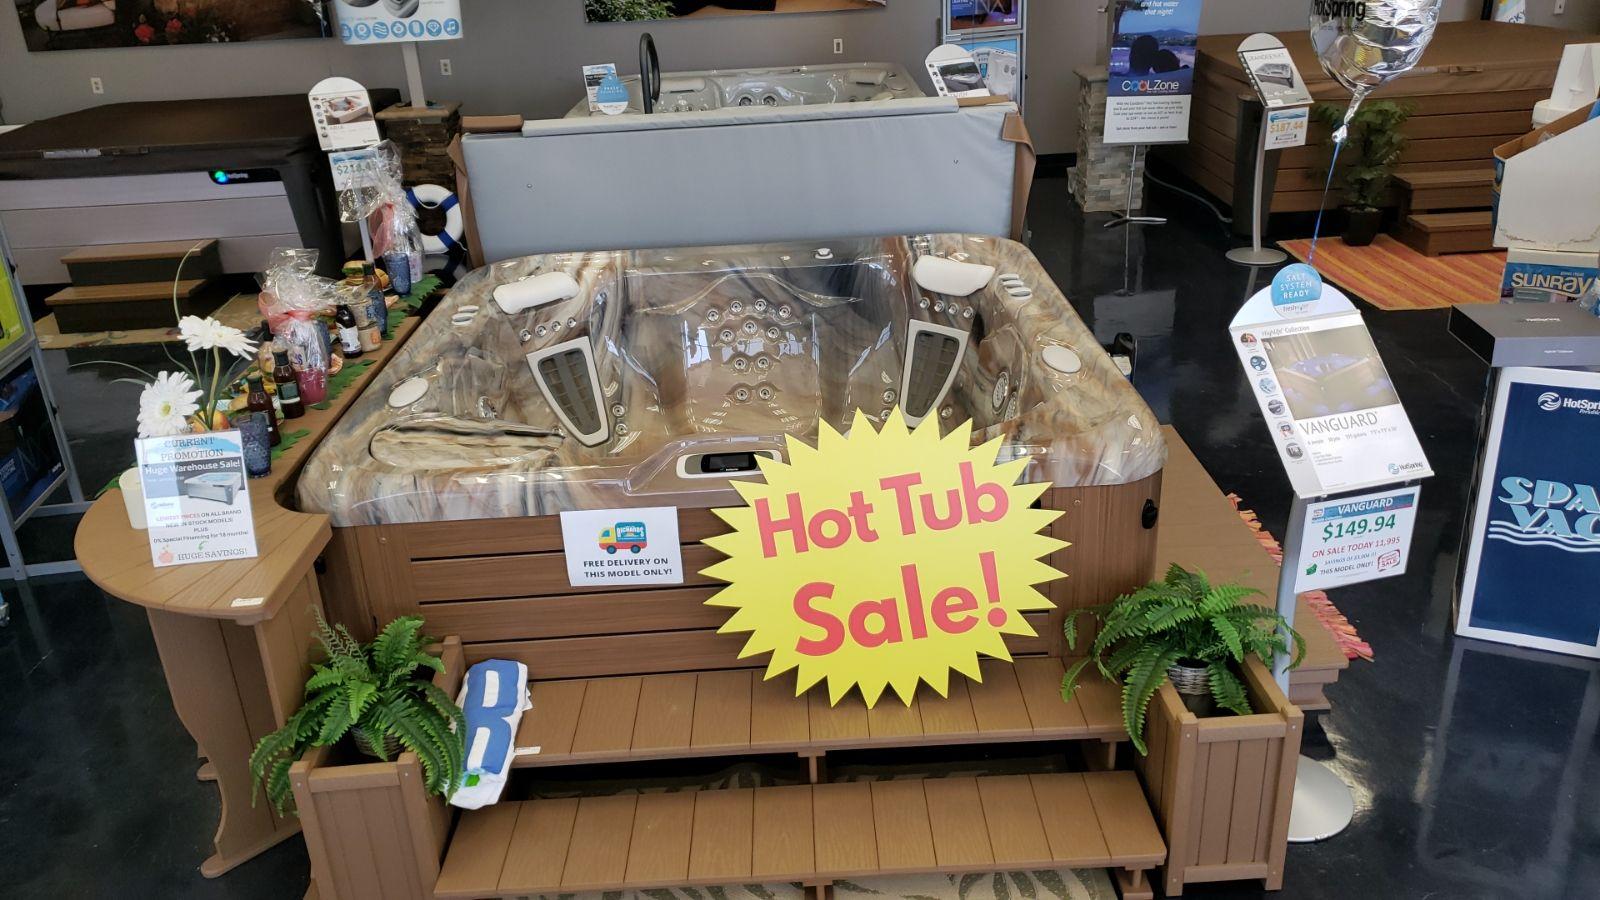 Hot Tub Remodel Sale - Richards Total Backyard Solutions